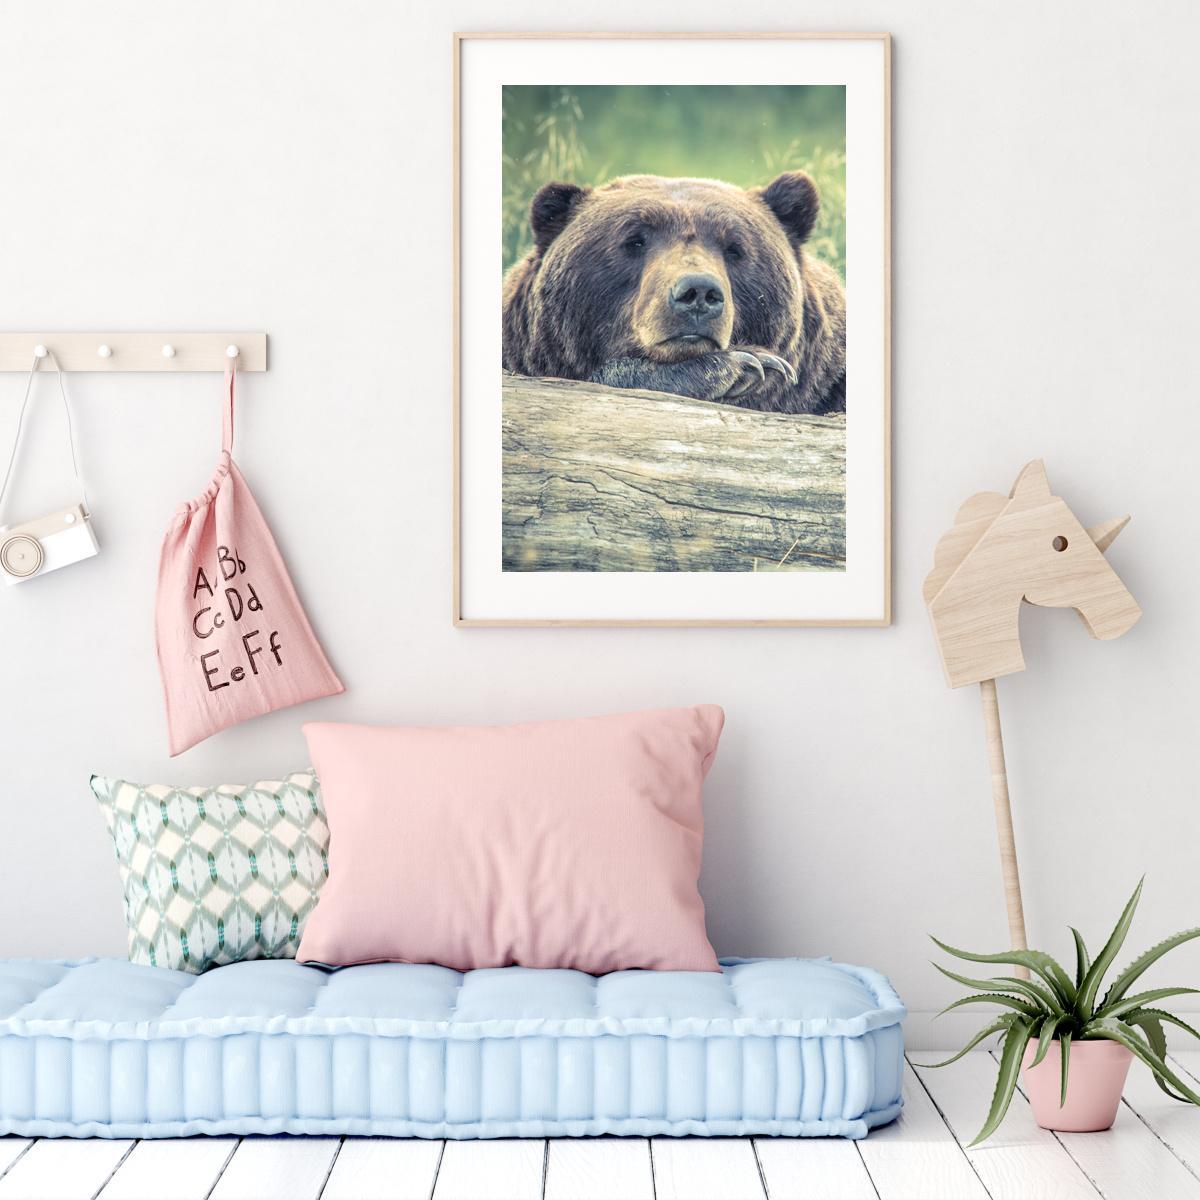 Plakat - Medvjed u mirovanju (S040006SA4)